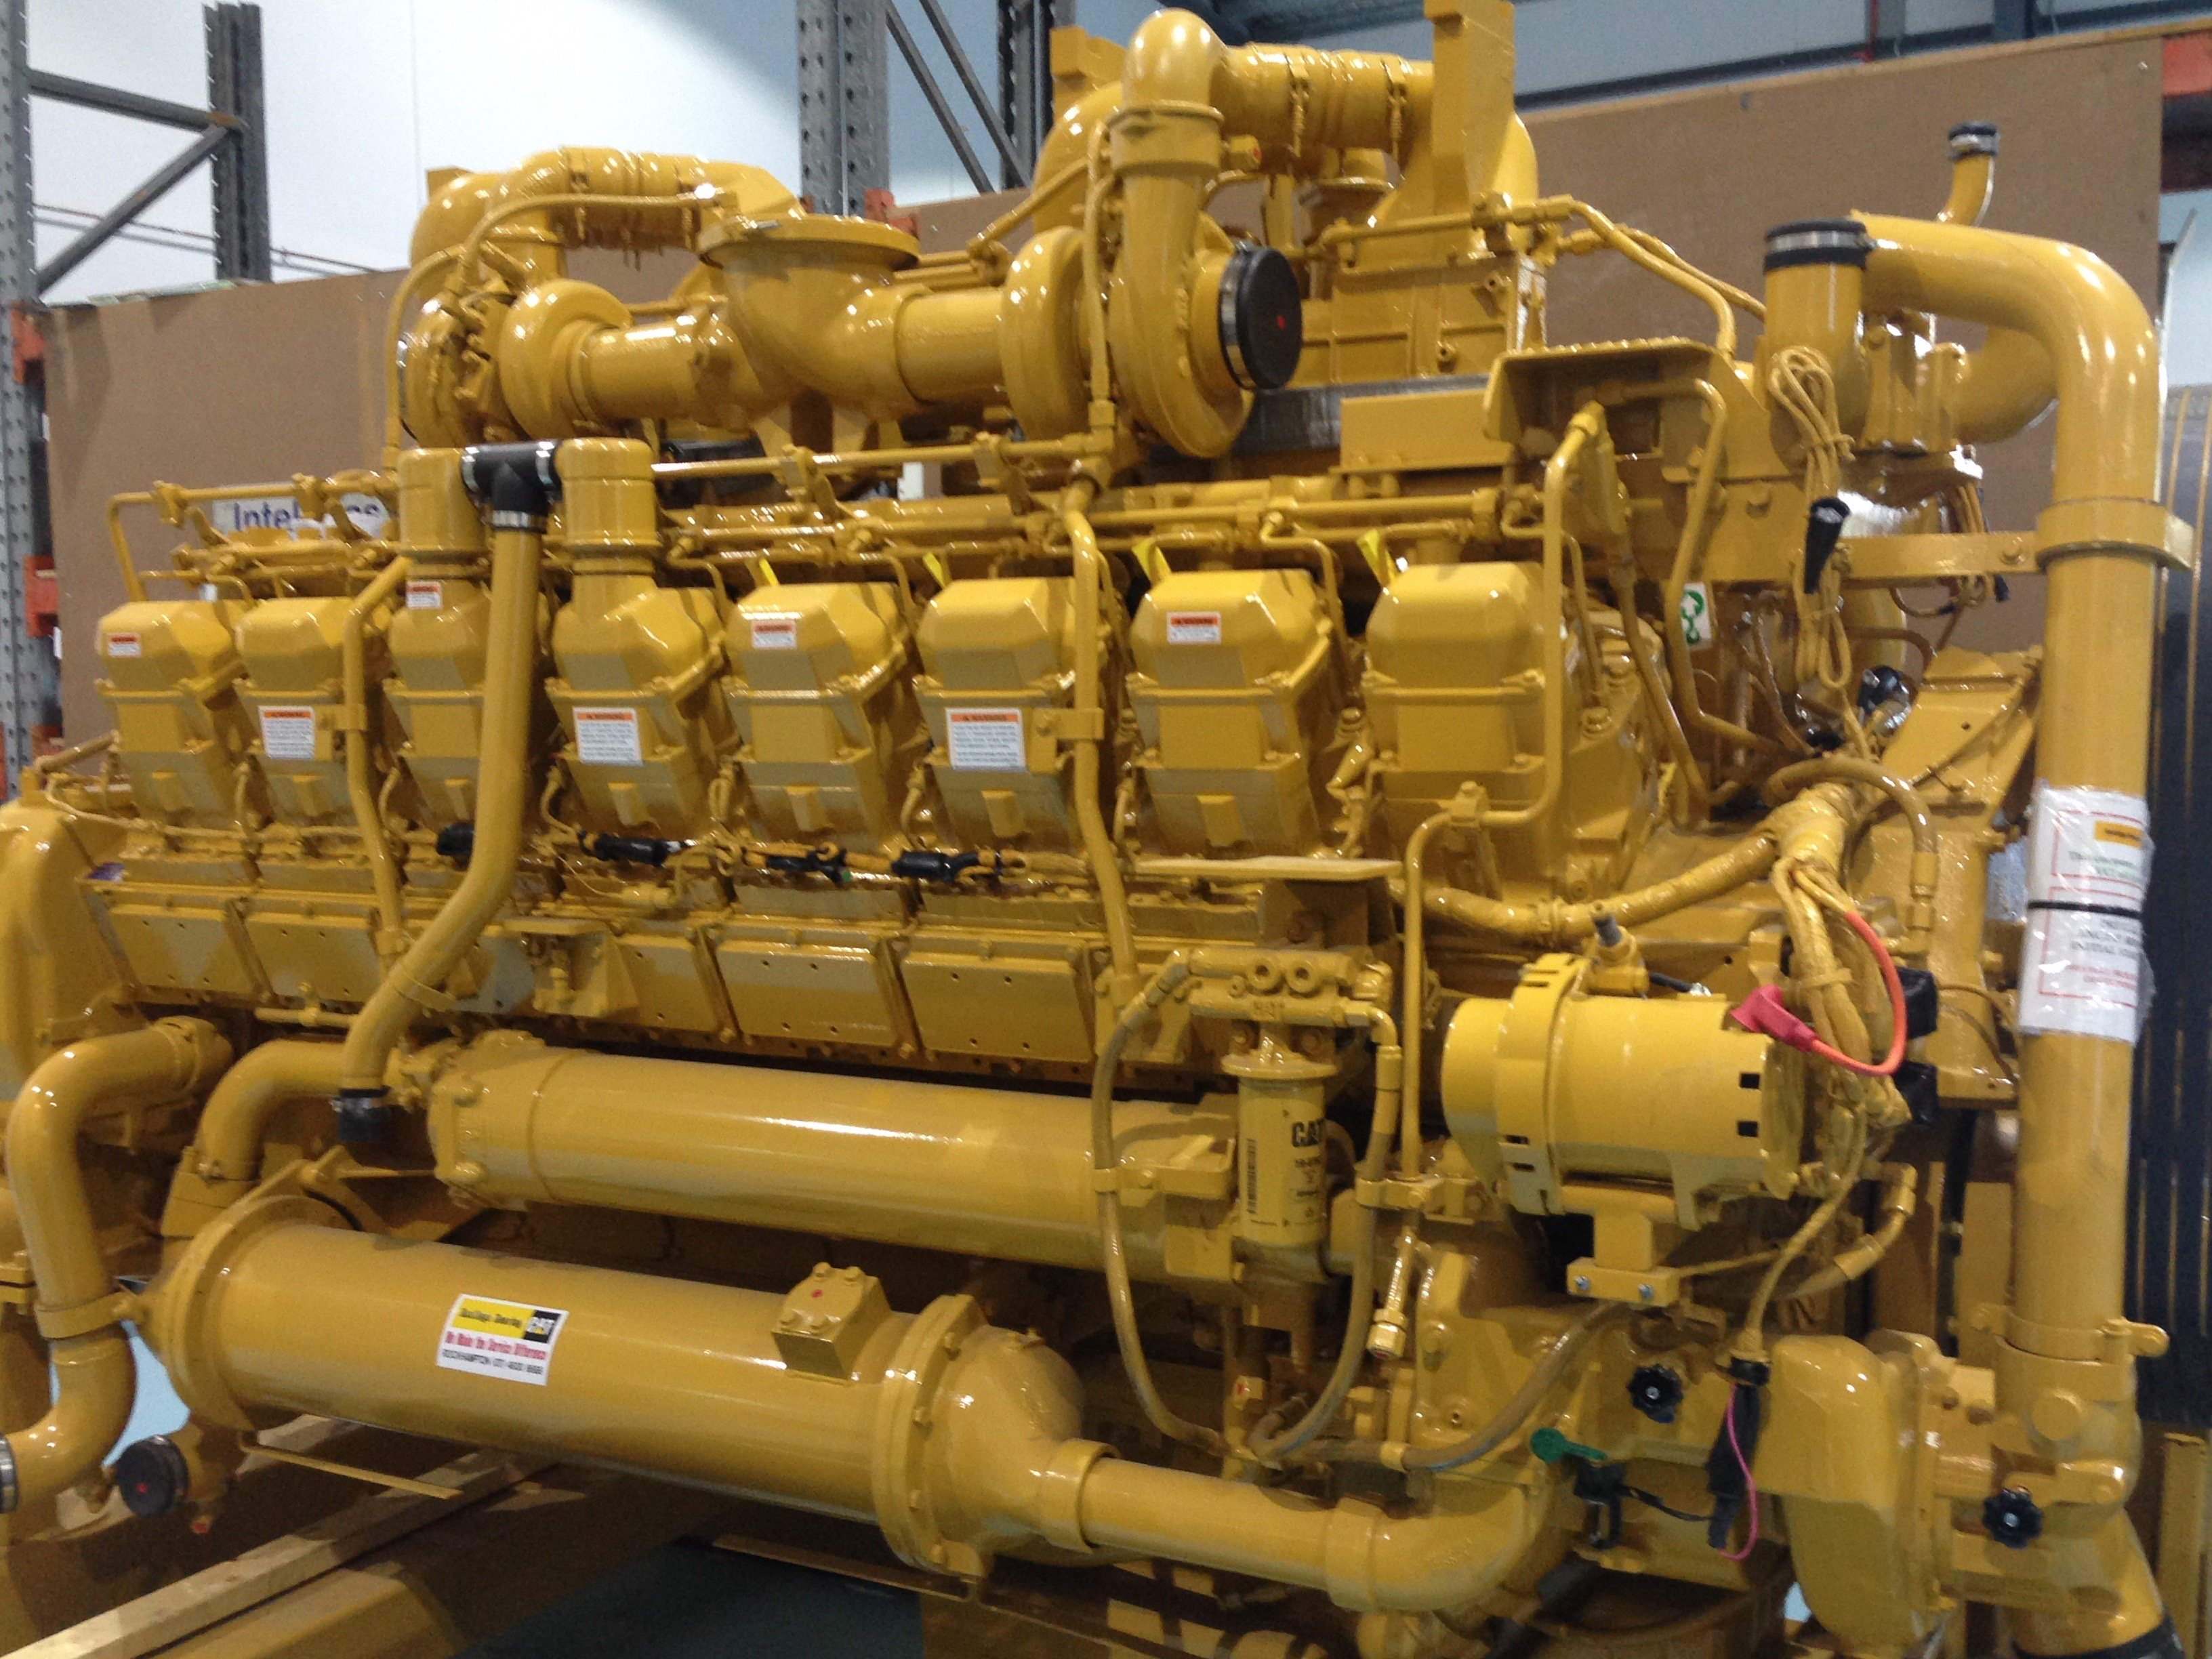 New CAT engine